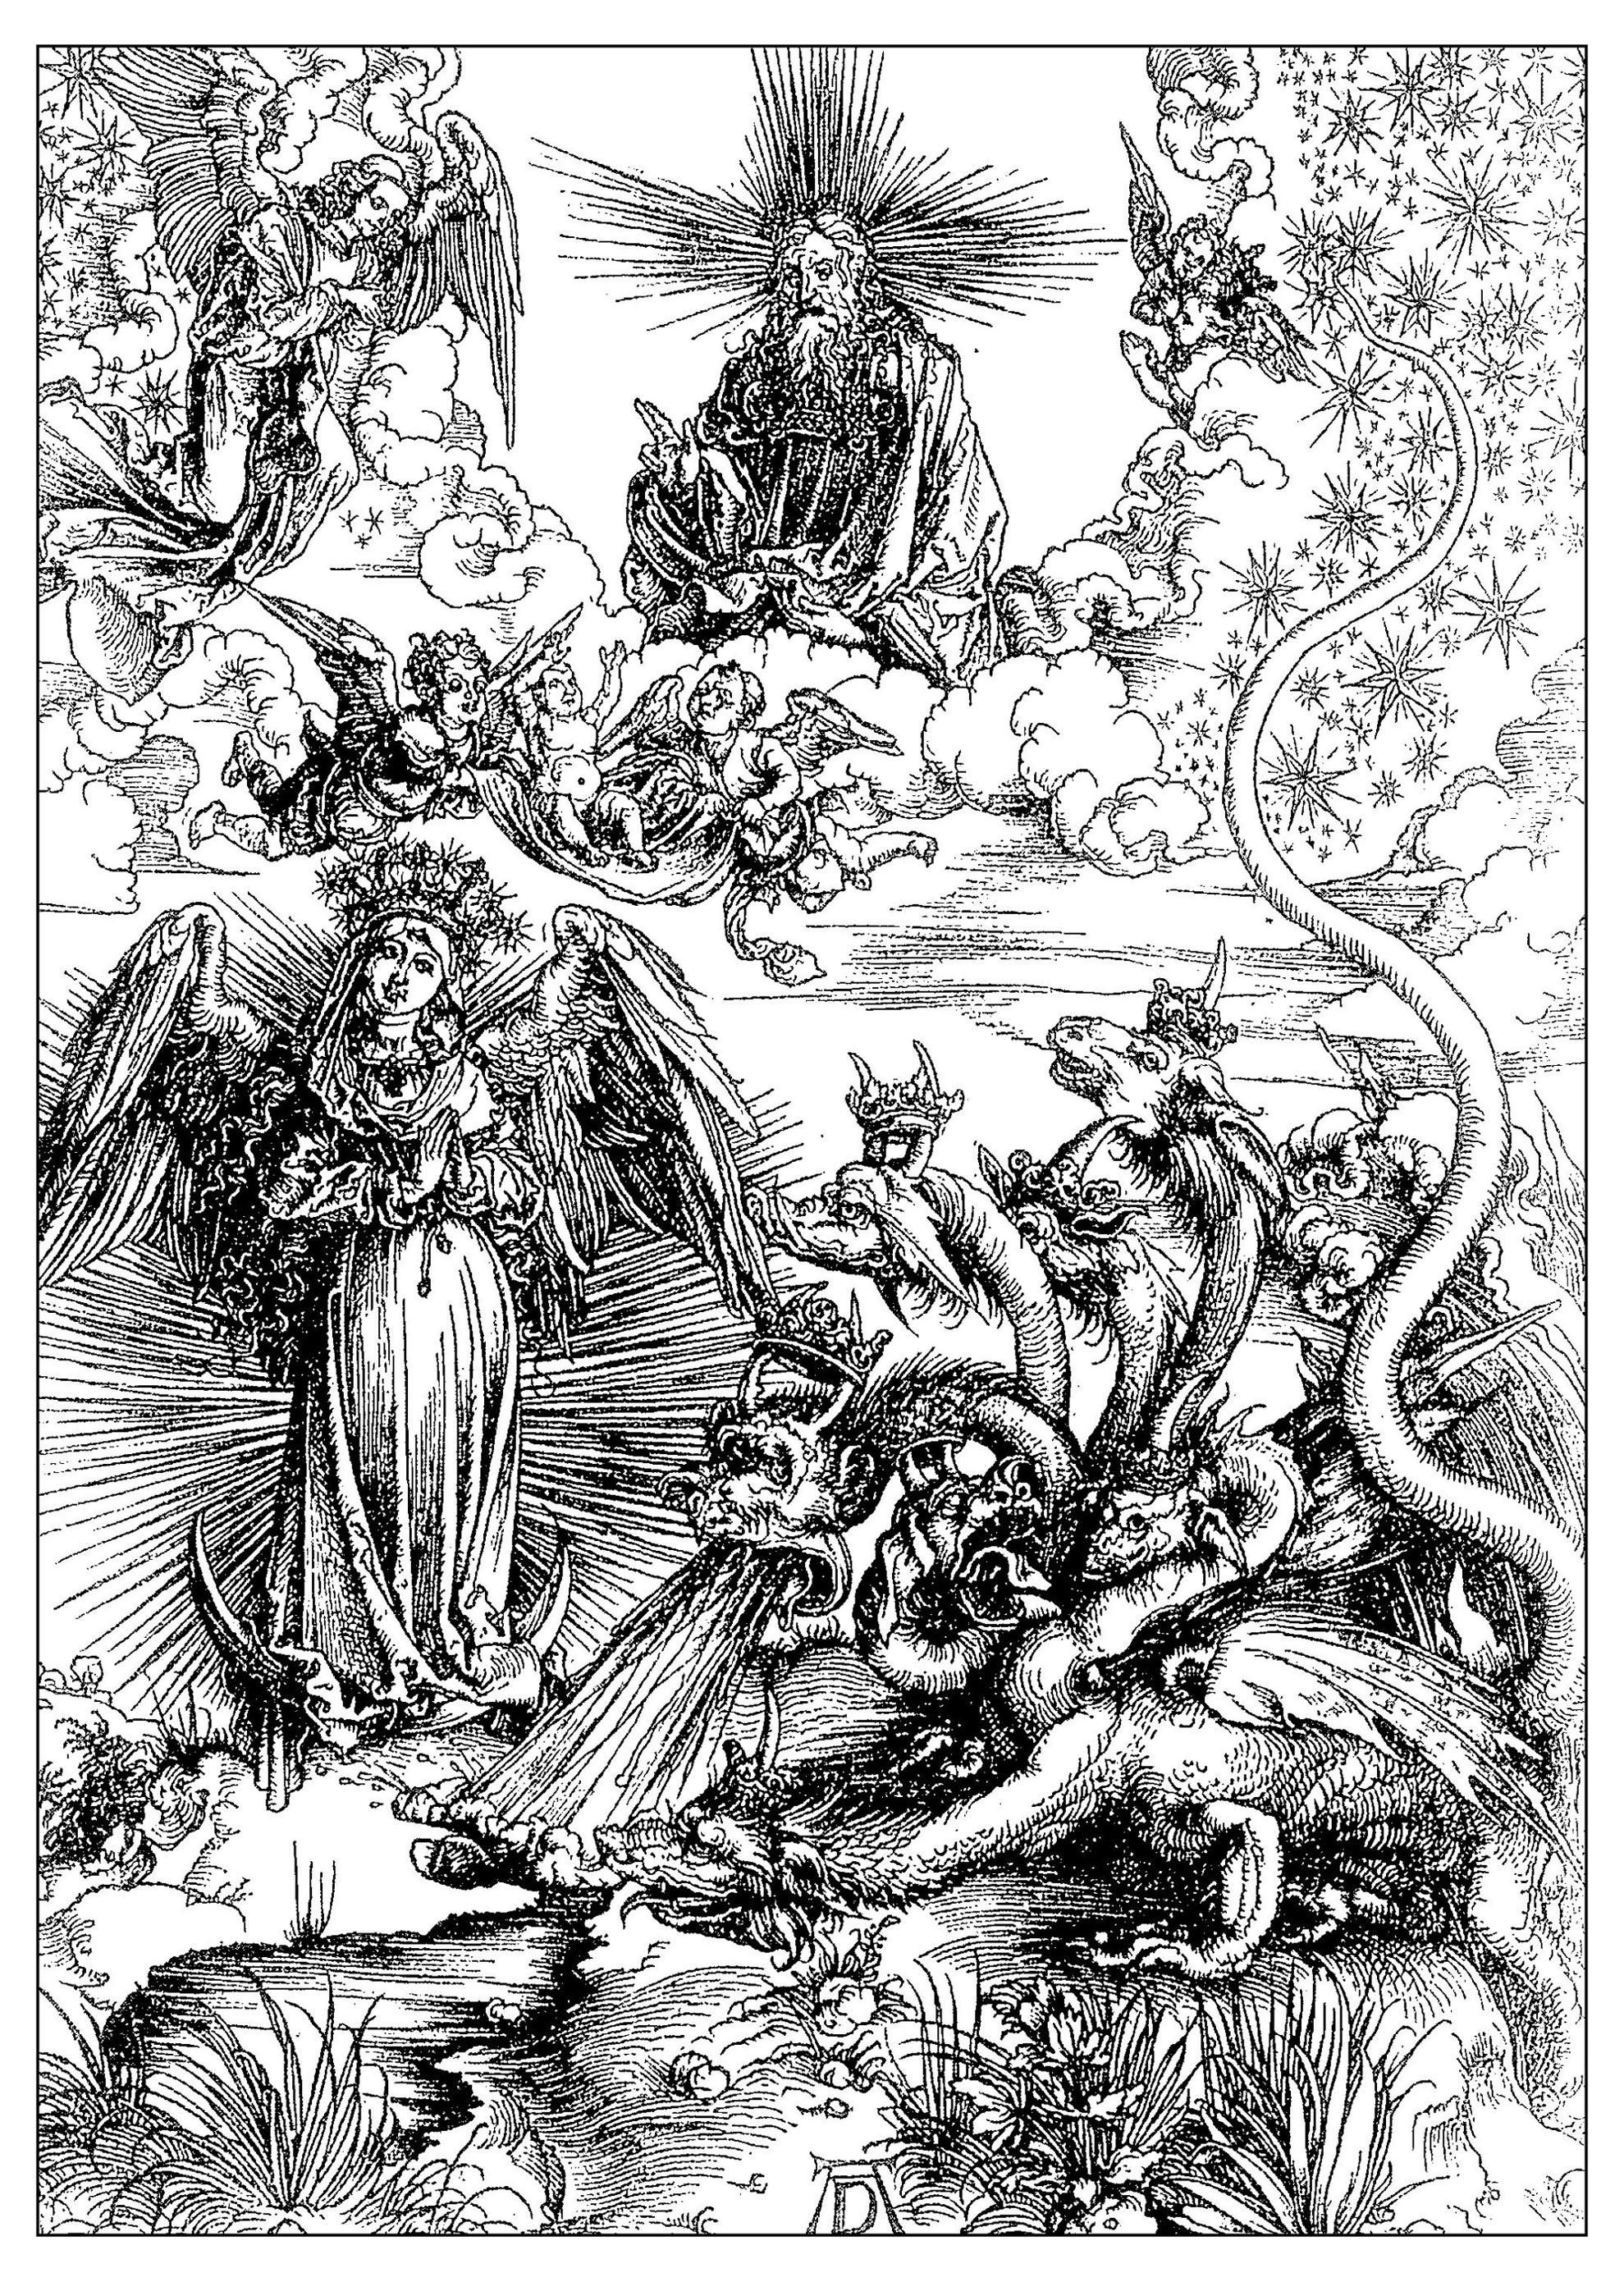 La femme de l'apocalypse, gravure de Albrecht Dürer, vers 1497